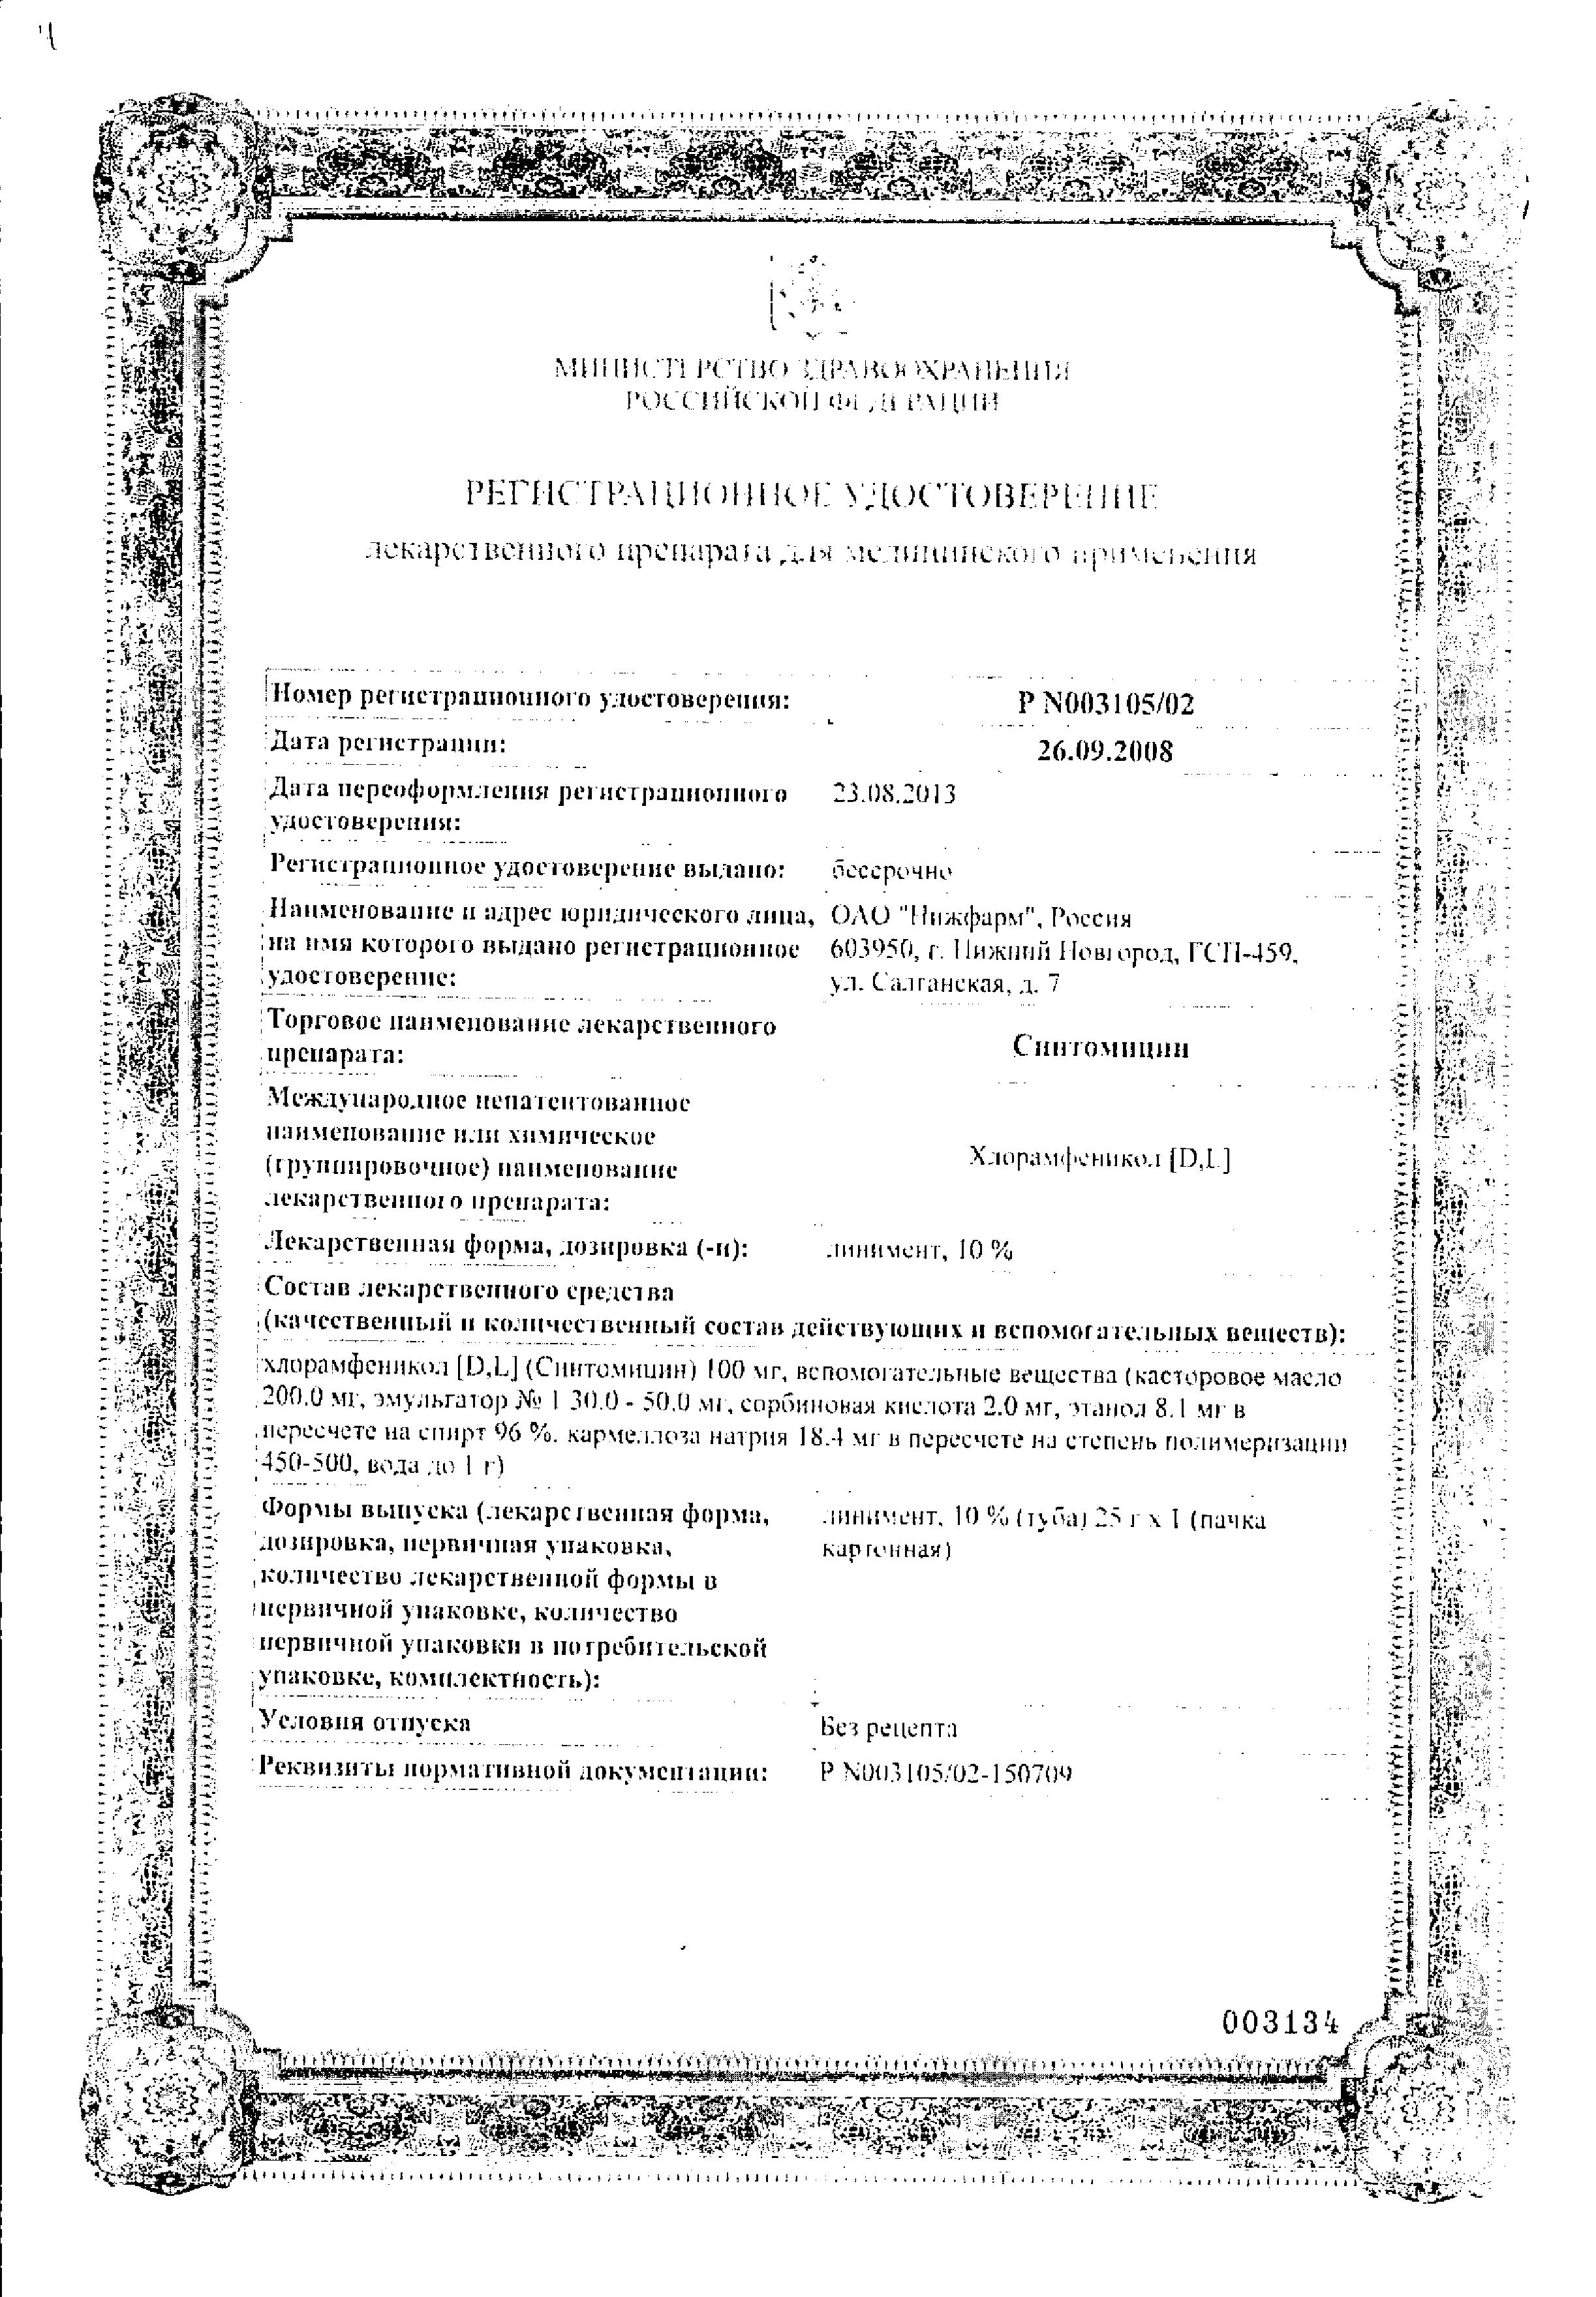 Синтомицин сертификат